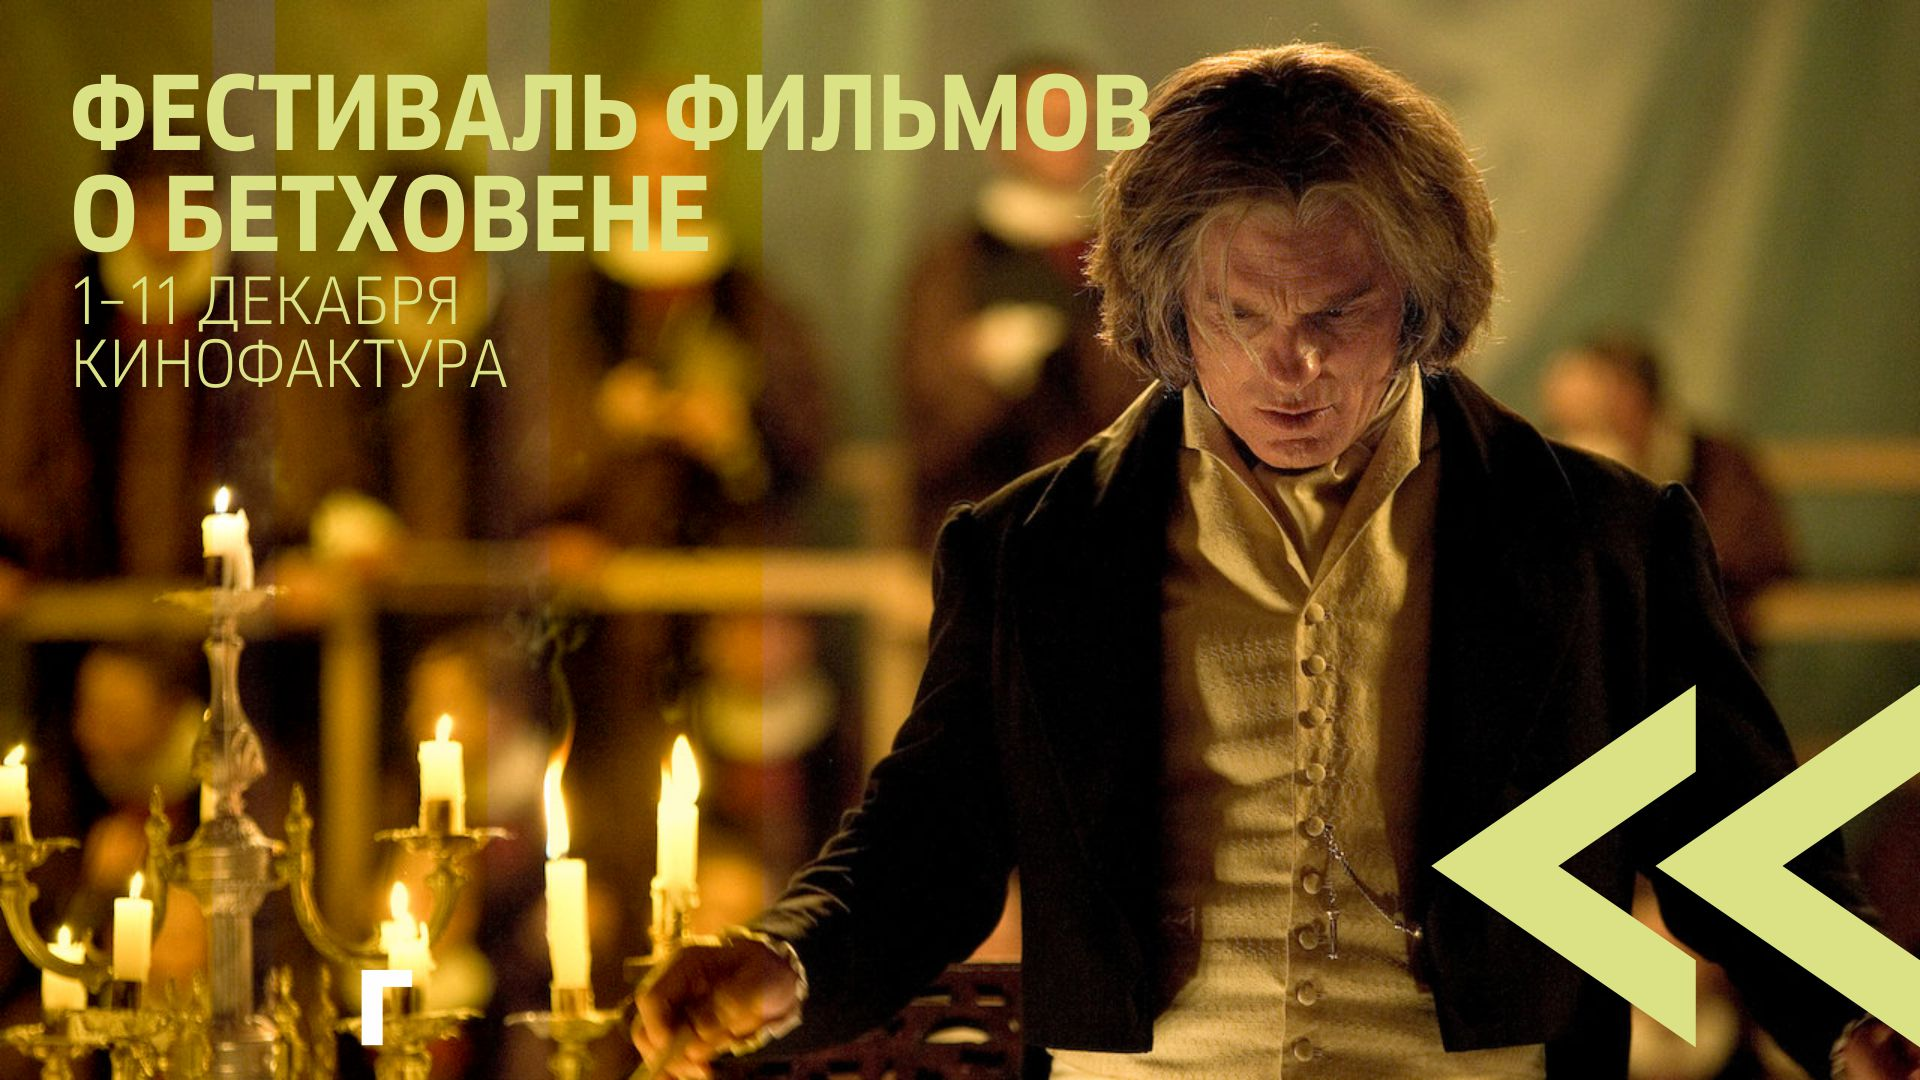 You are currently viewing Фестиваль фильмов о Бетховене